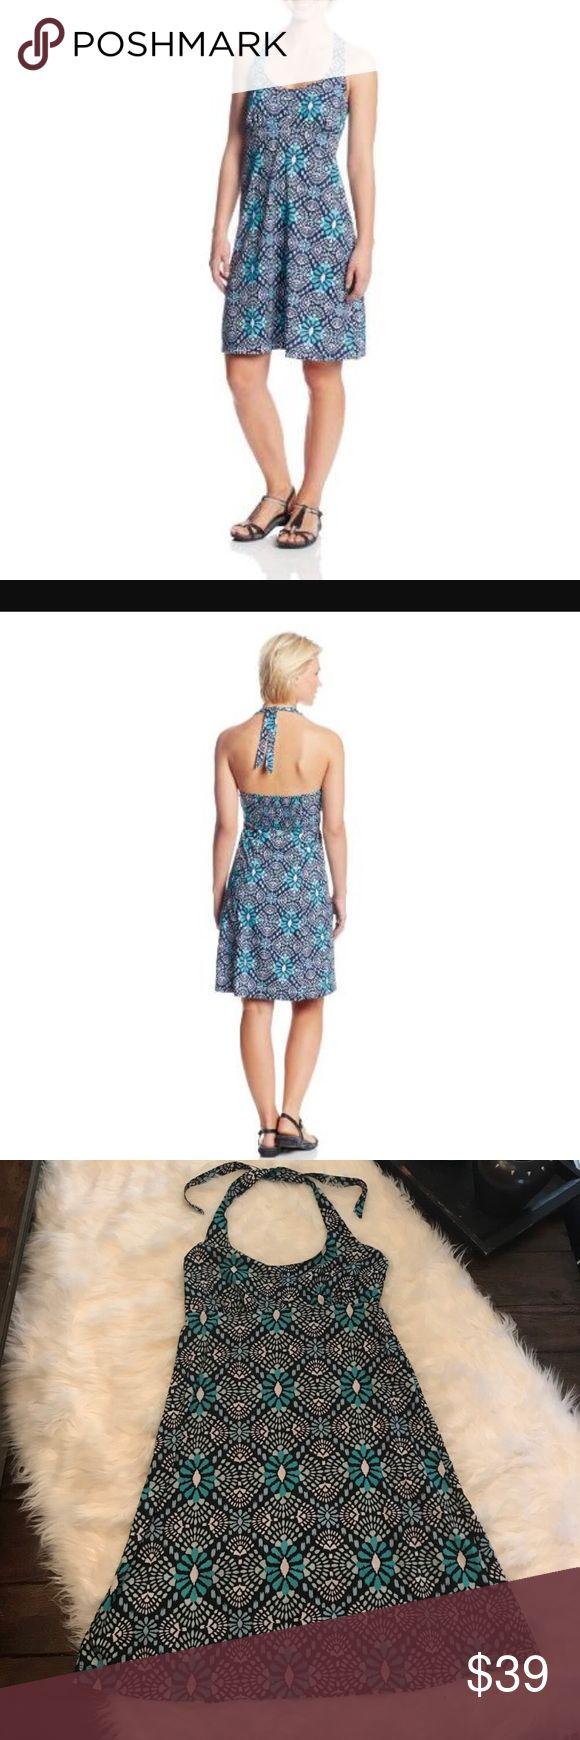 Columbia Sportswear Armadale Halter Top Dress M Columbia Sportswear Armadale Halter Top Dress for Women Medium. Worn once Columbia Dresses